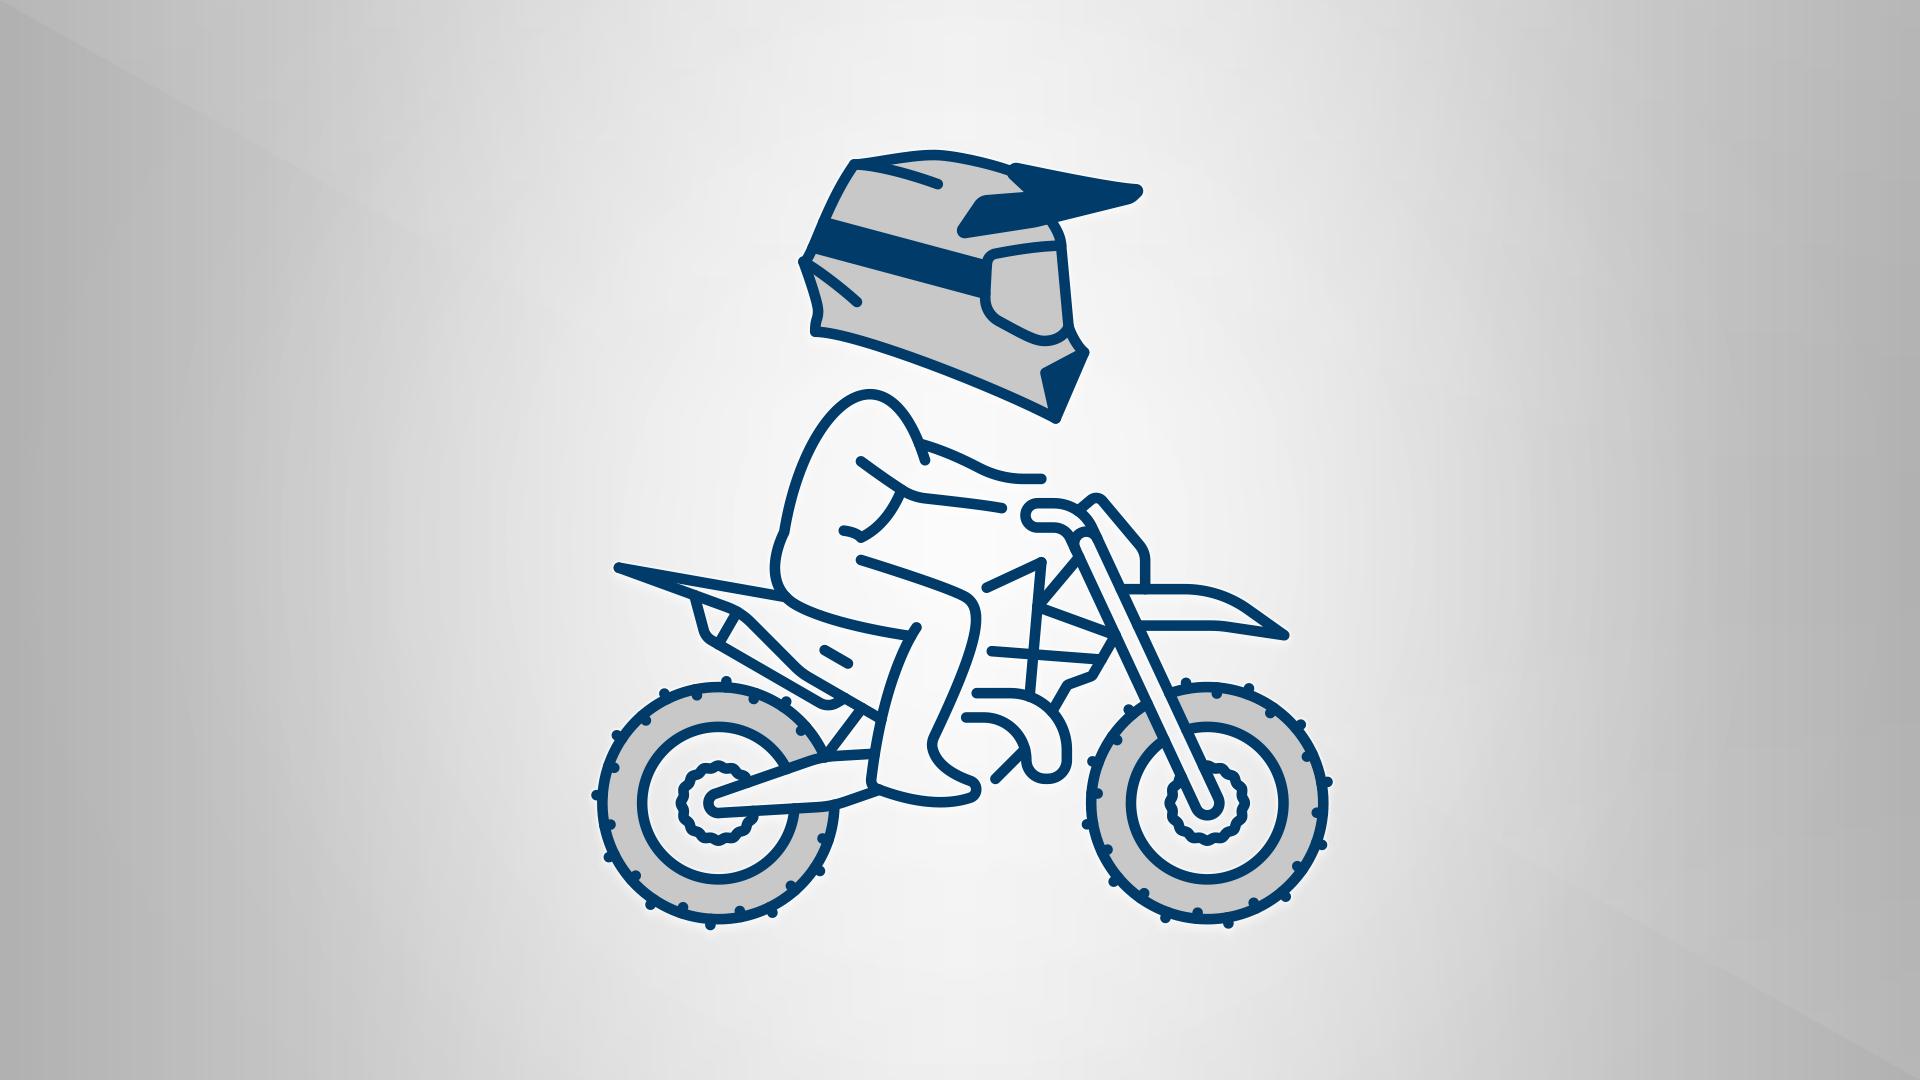 Full-time Rider